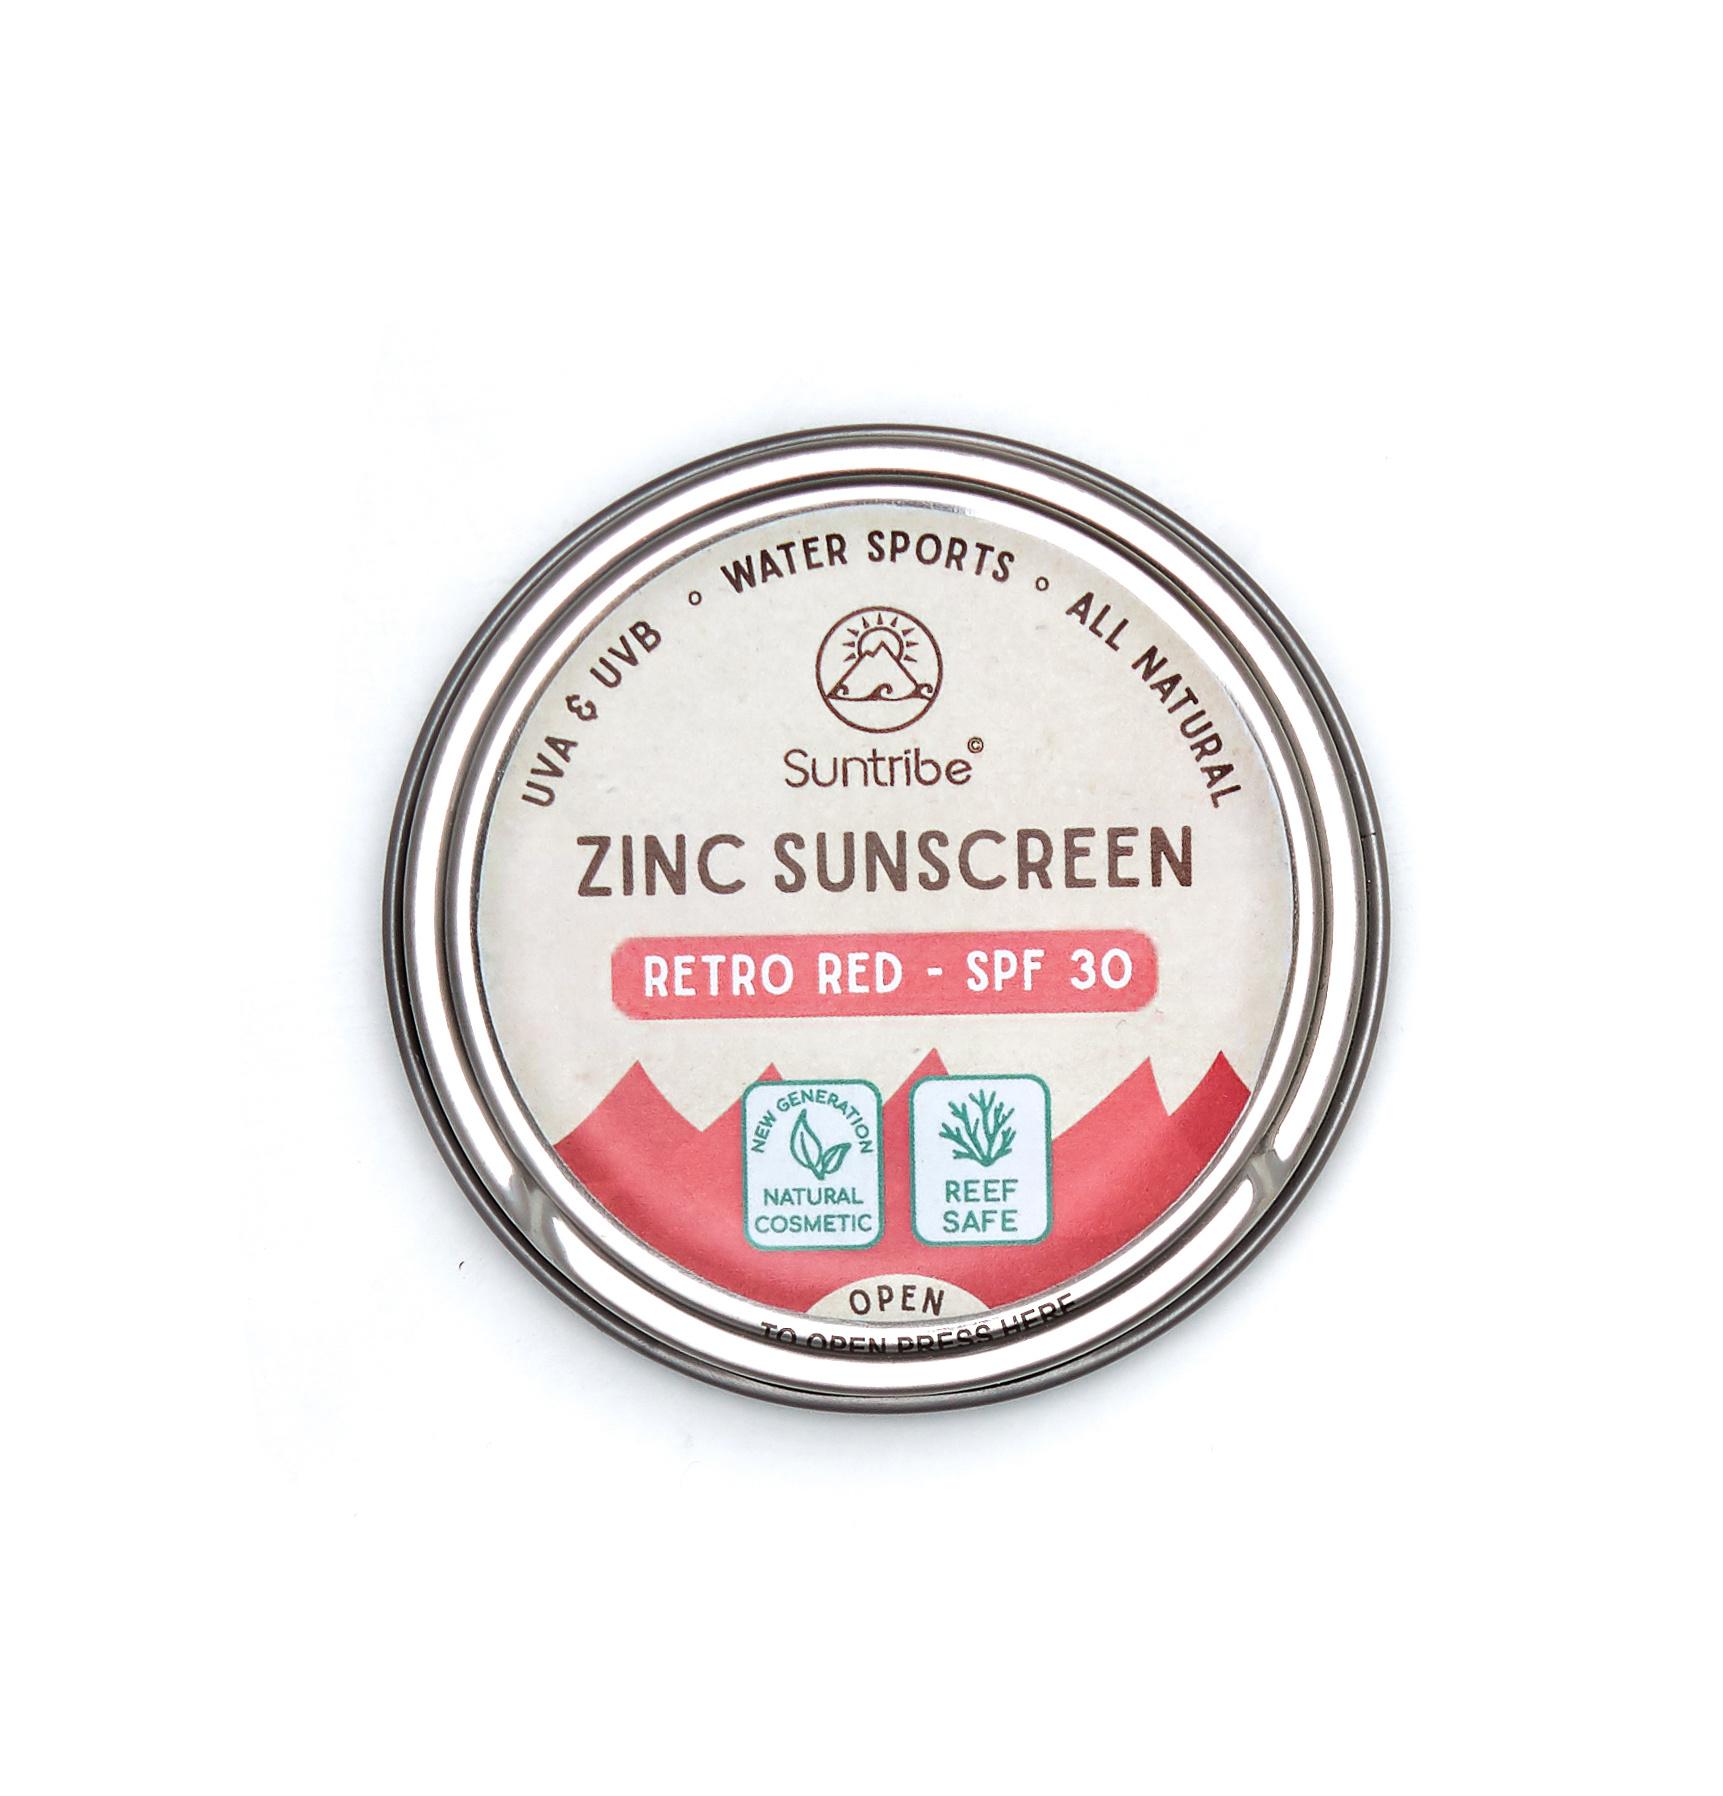 Suntribe Zinc Sunscreen Tinted - Retro Red - SPF30